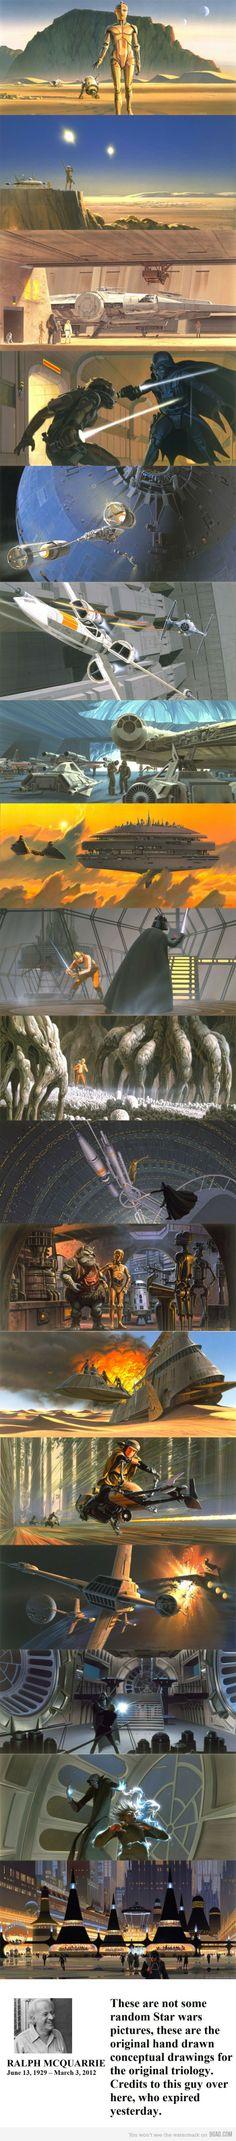 Star Wars conceptual drawings.